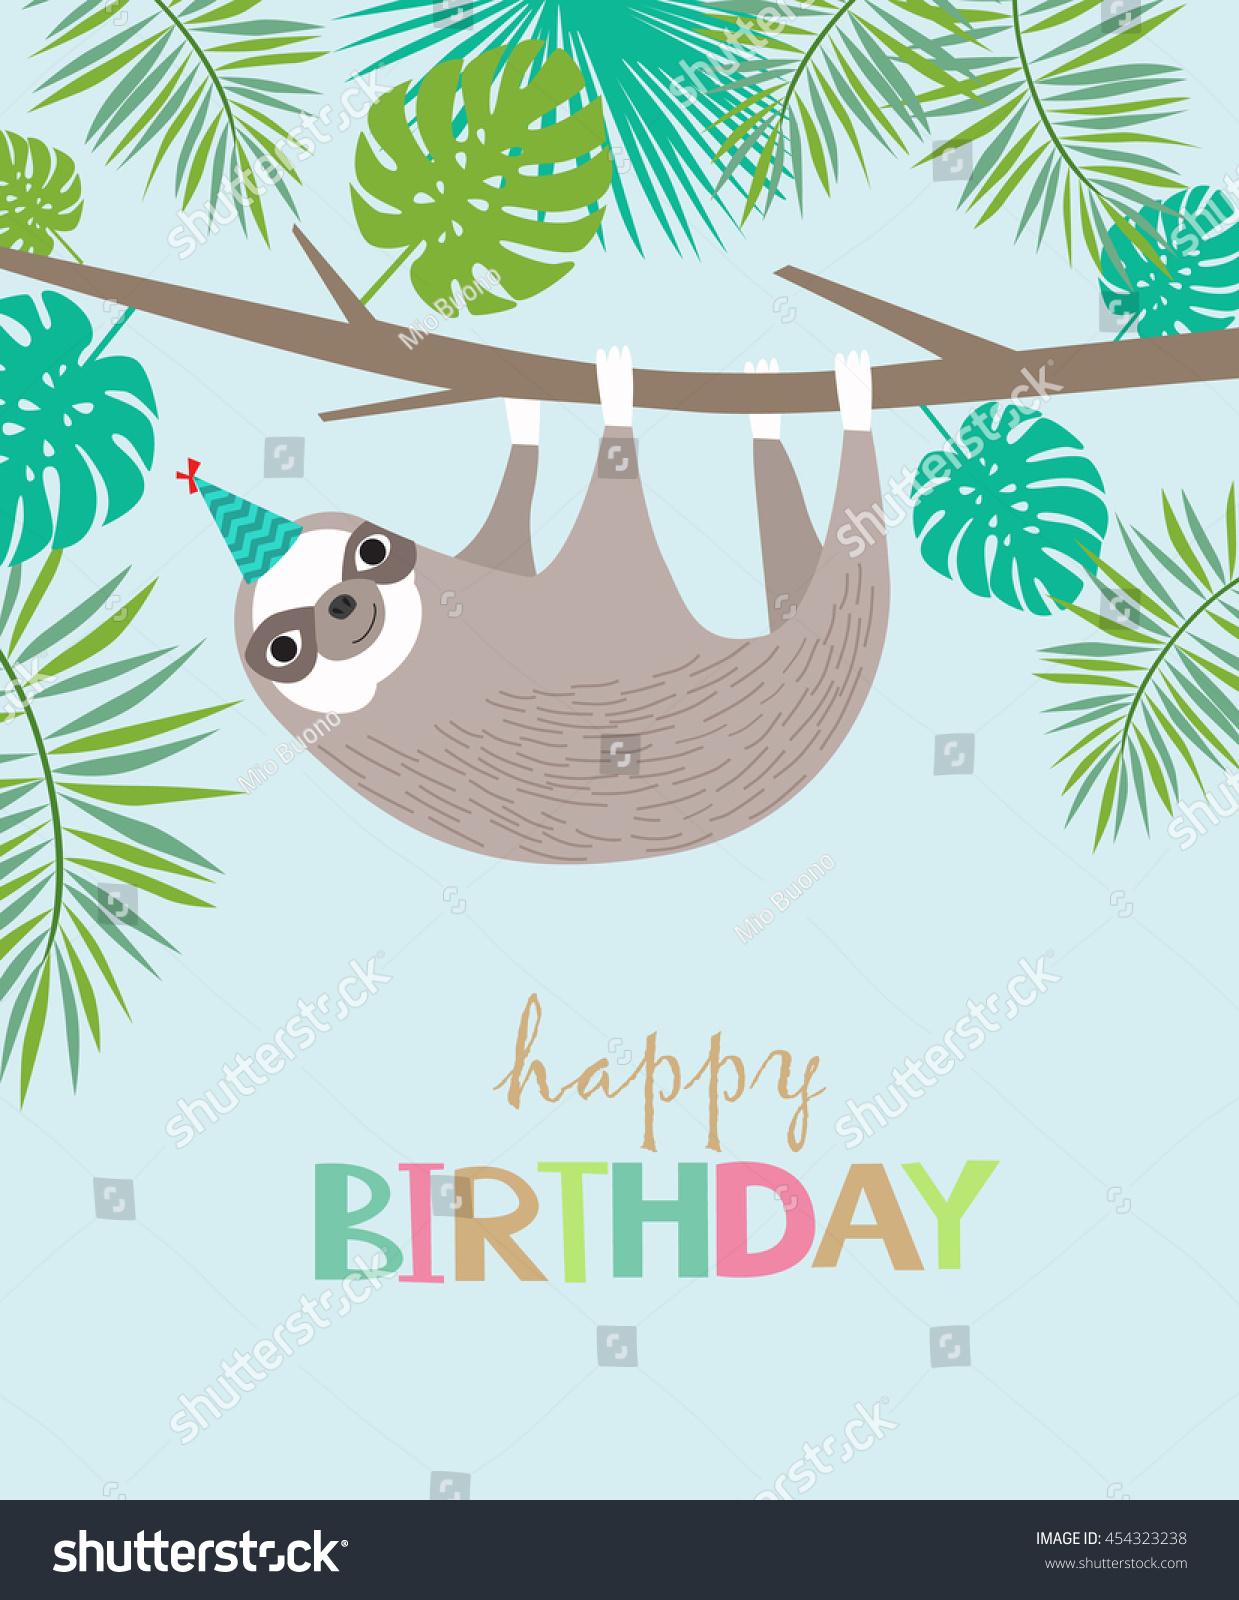 happy birthday card cute sloth stock vector   shutterstock, Birthday card